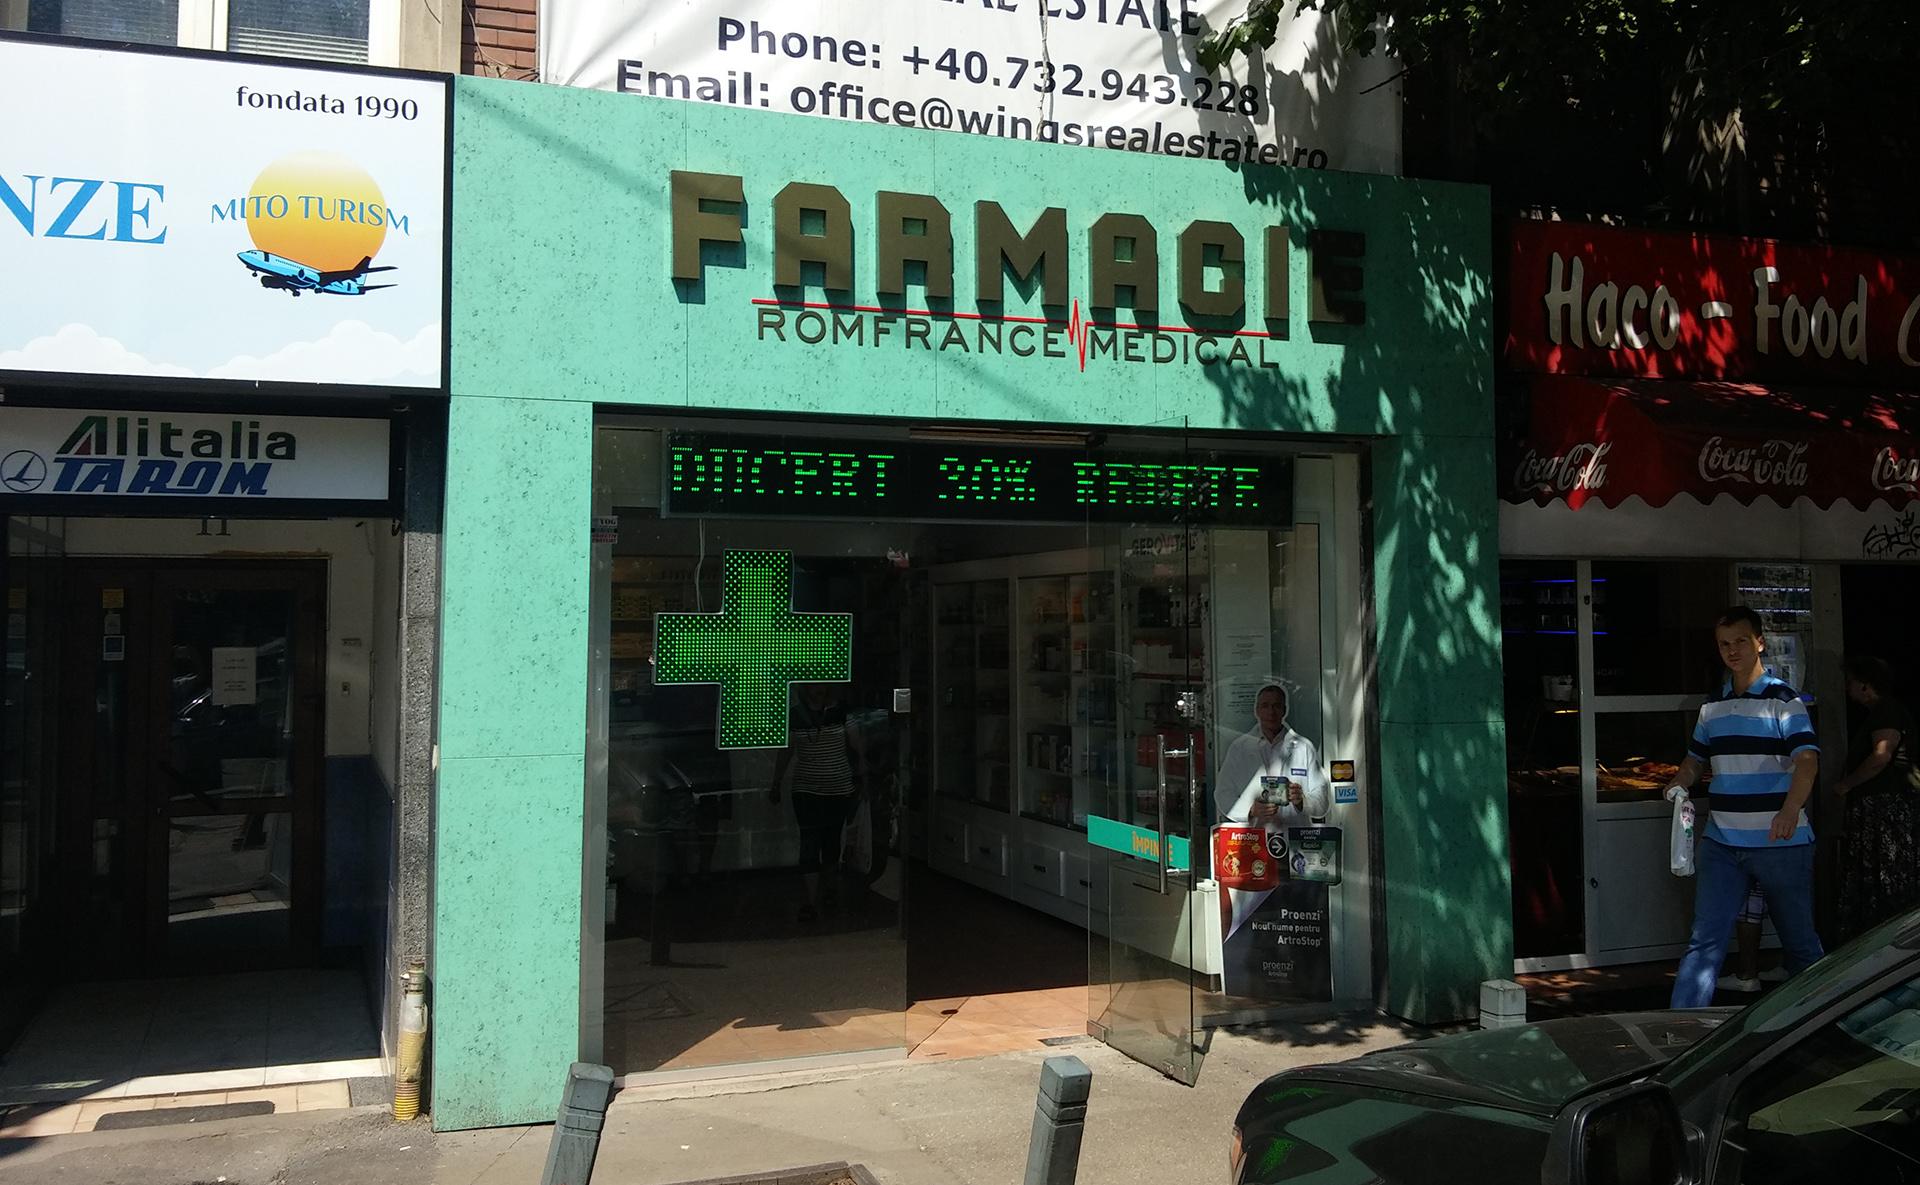 amenajare fatada farmacie